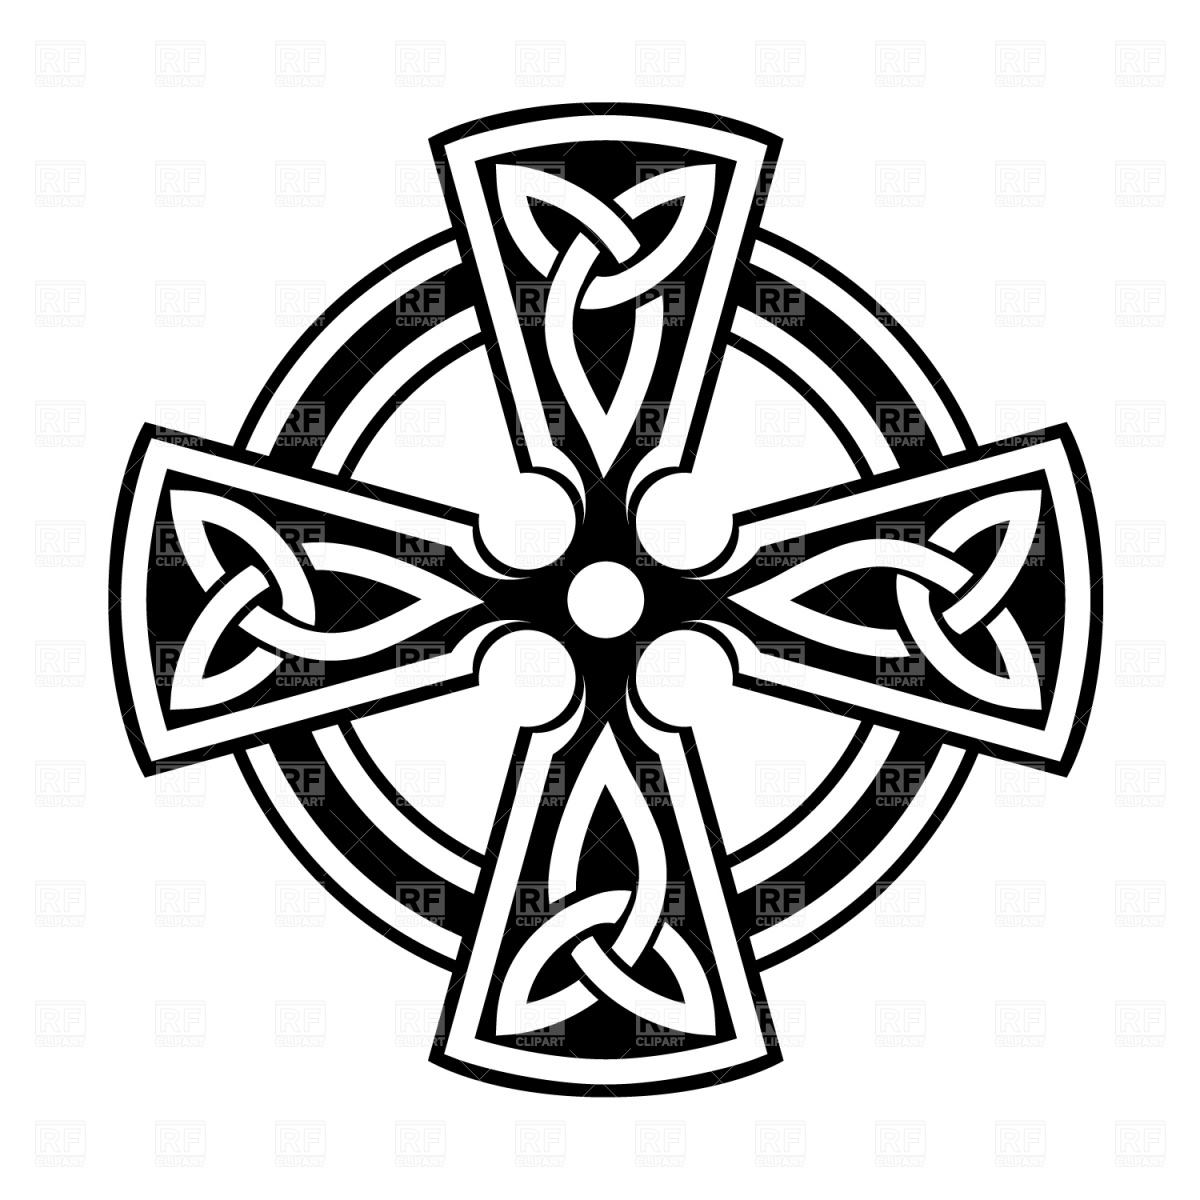 Celtic Clip Art U0026middot; Christian C-Celtic Clip Art u0026middot; christian cliparts u0026middot; Cross Clip Art-1